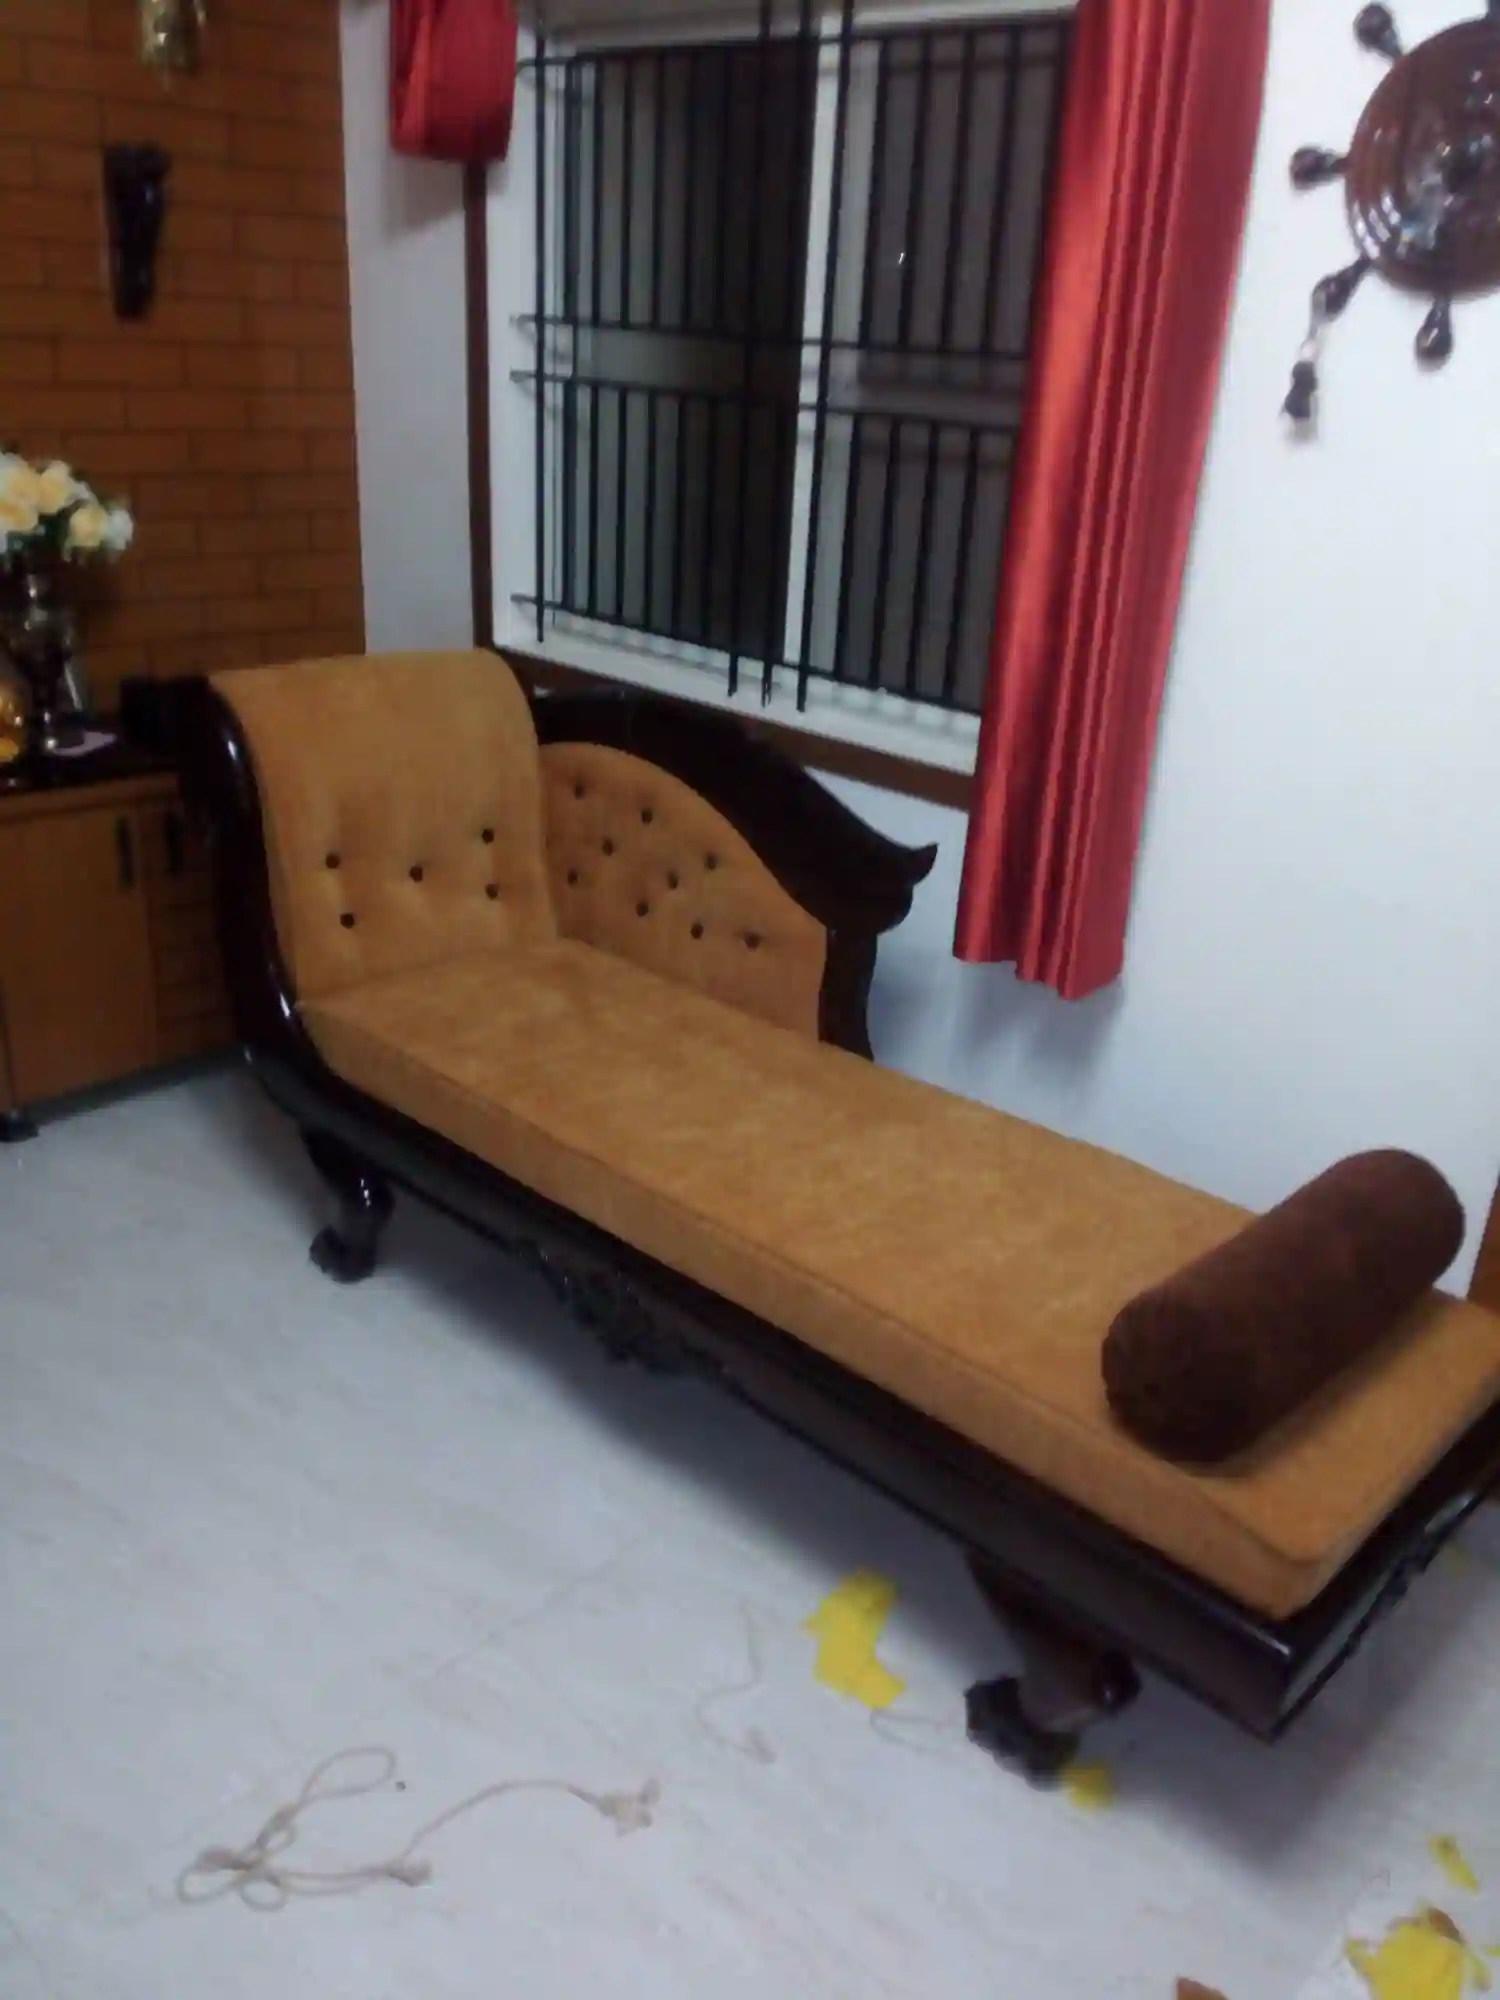 sofa cleaning services bangalore wayfair sleeper r k bedding and center photos hessargatta main road manufacturer